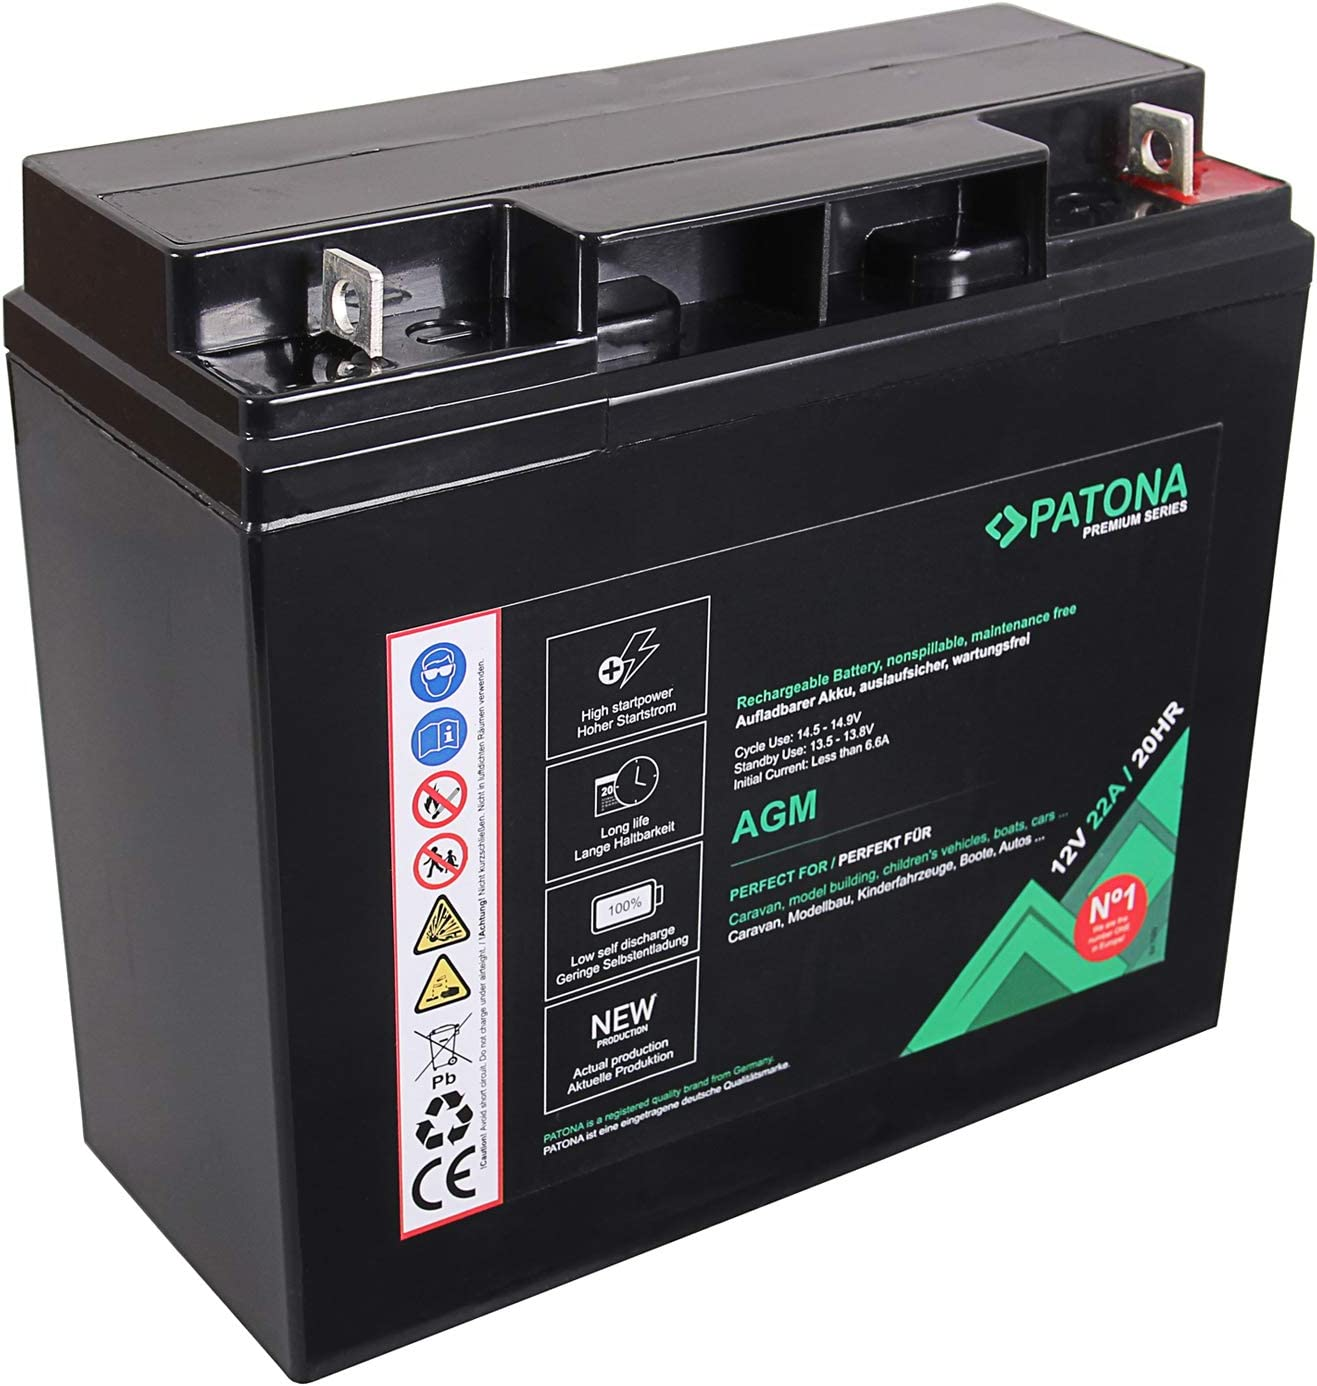 Patona Premium AGM 12V 12A Lead Battery VRLA Maintenance-Free 1800 Cycles